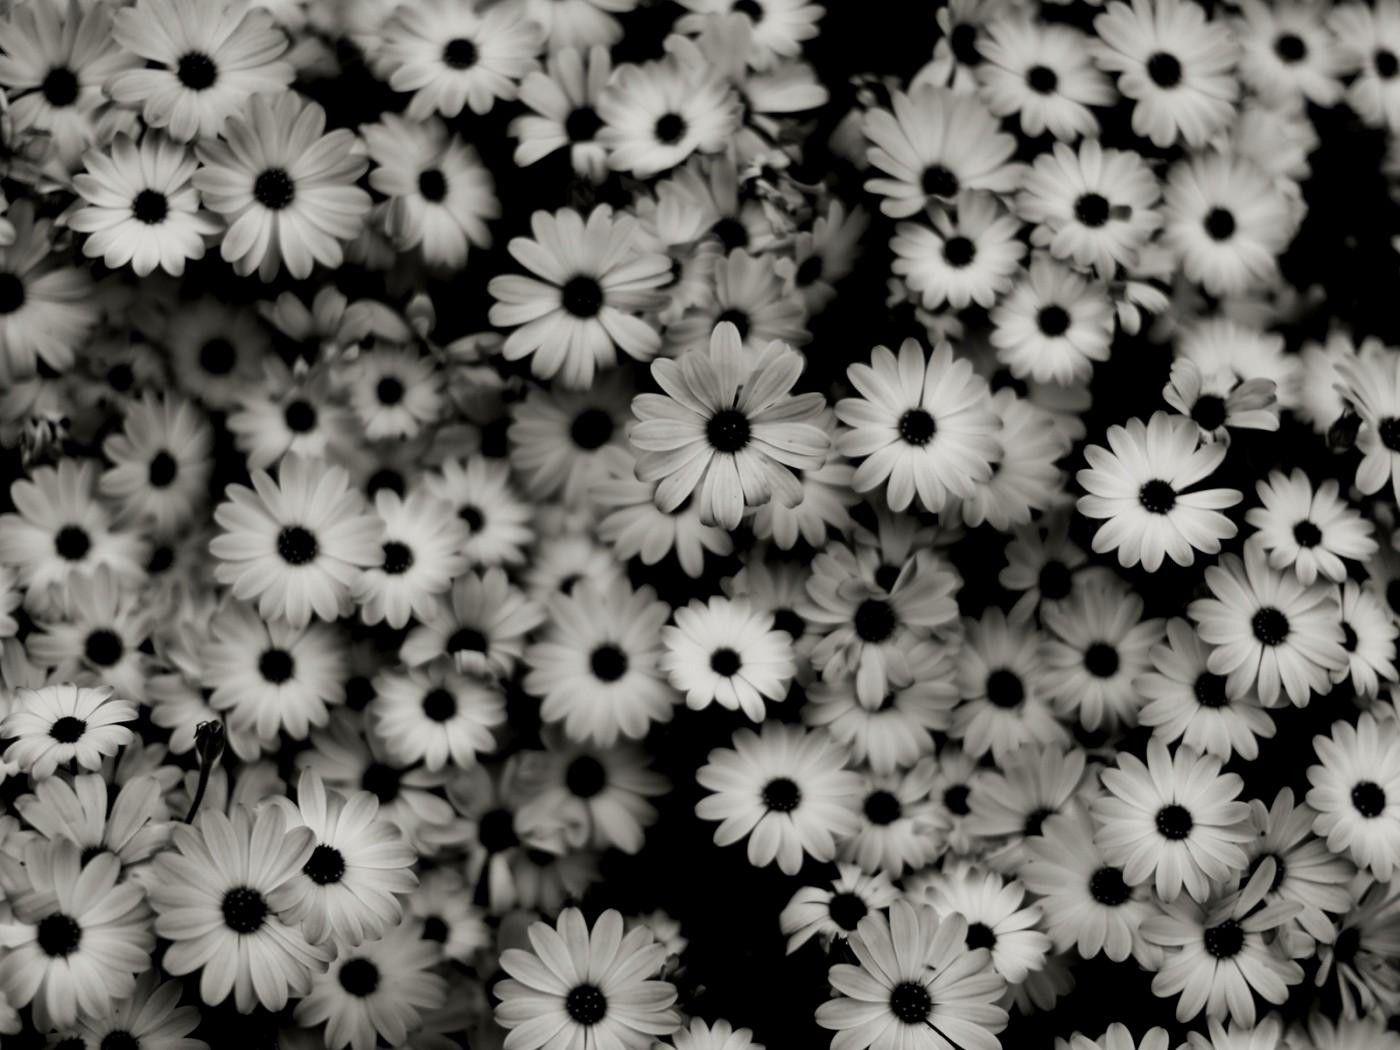 Wallpapers bonitos do tumblr preto e branco Branco e